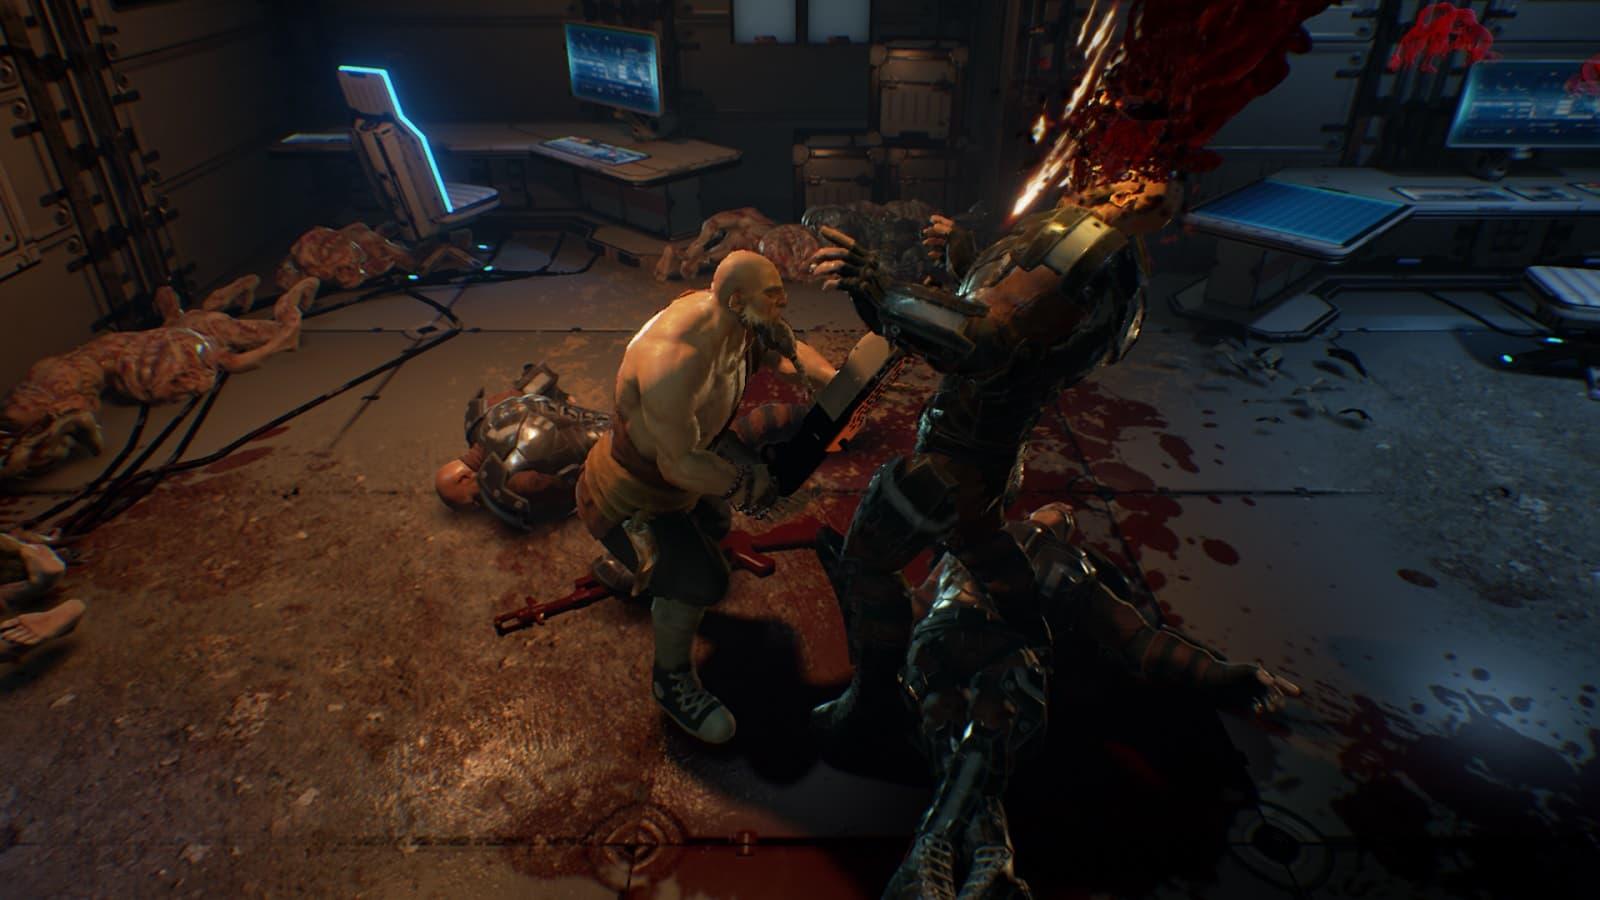 Redeemer, Indie Game, Beat 'em up, SciFi, Review, инди, экшен, мордобой, фантастика, обзор игры, рецензия на игру